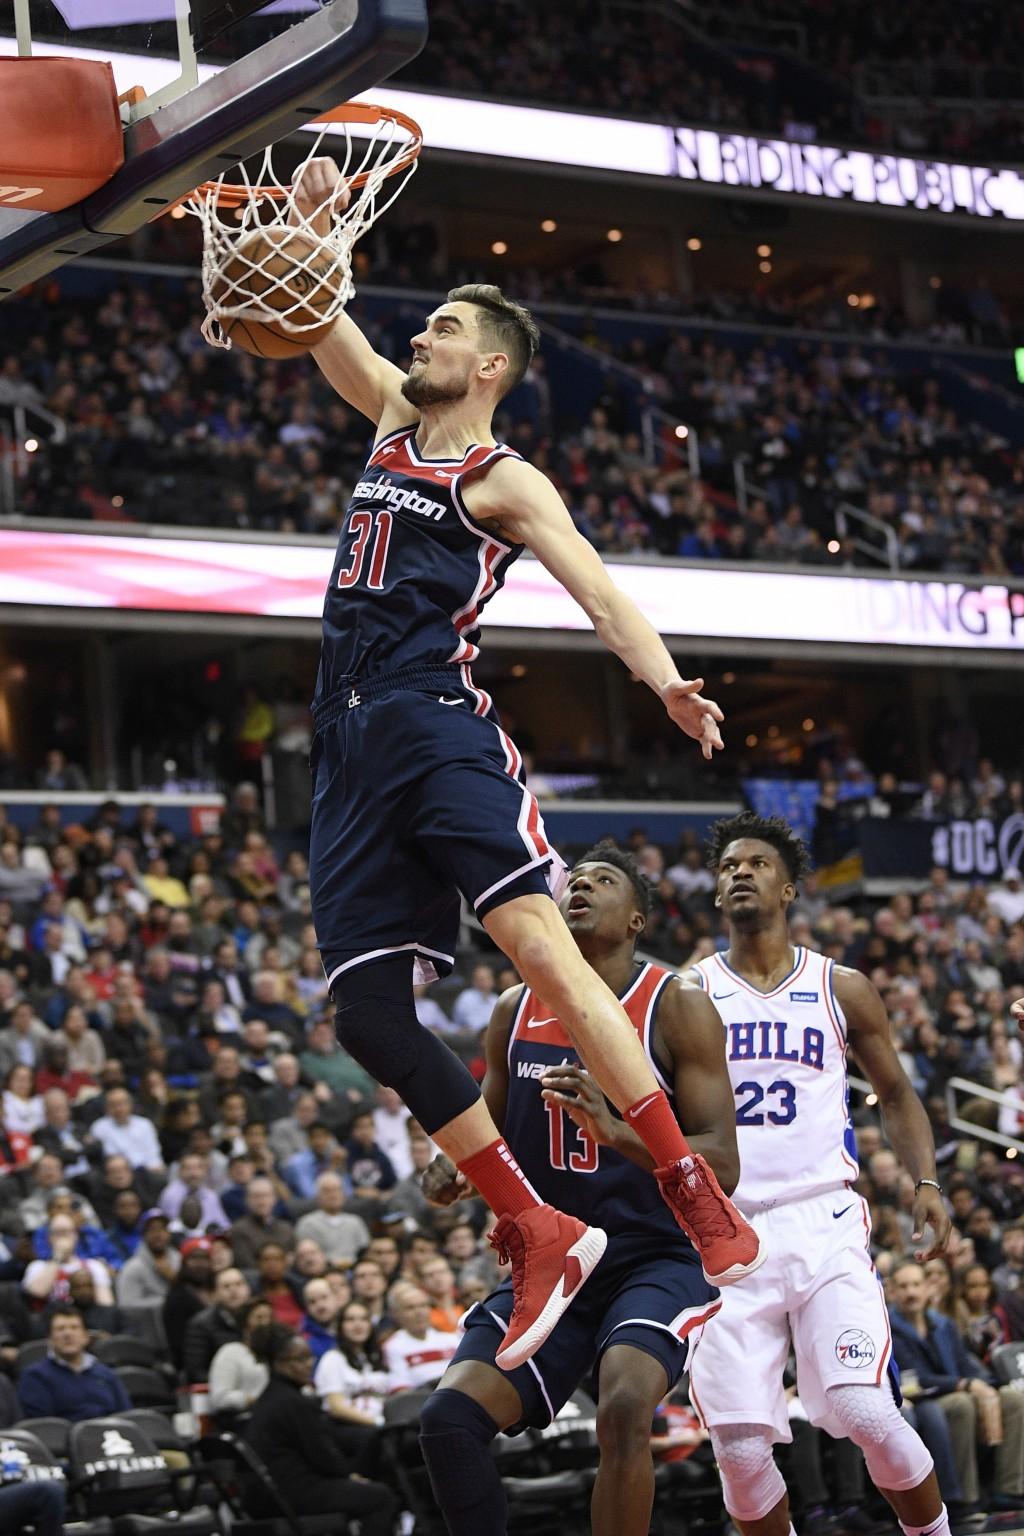 Washington Wizards guard Tomas Satoransky (31), of the Czech Republic, dunks past Philadelphia 76ers guard Jimmy Butler (23) during the second half of...